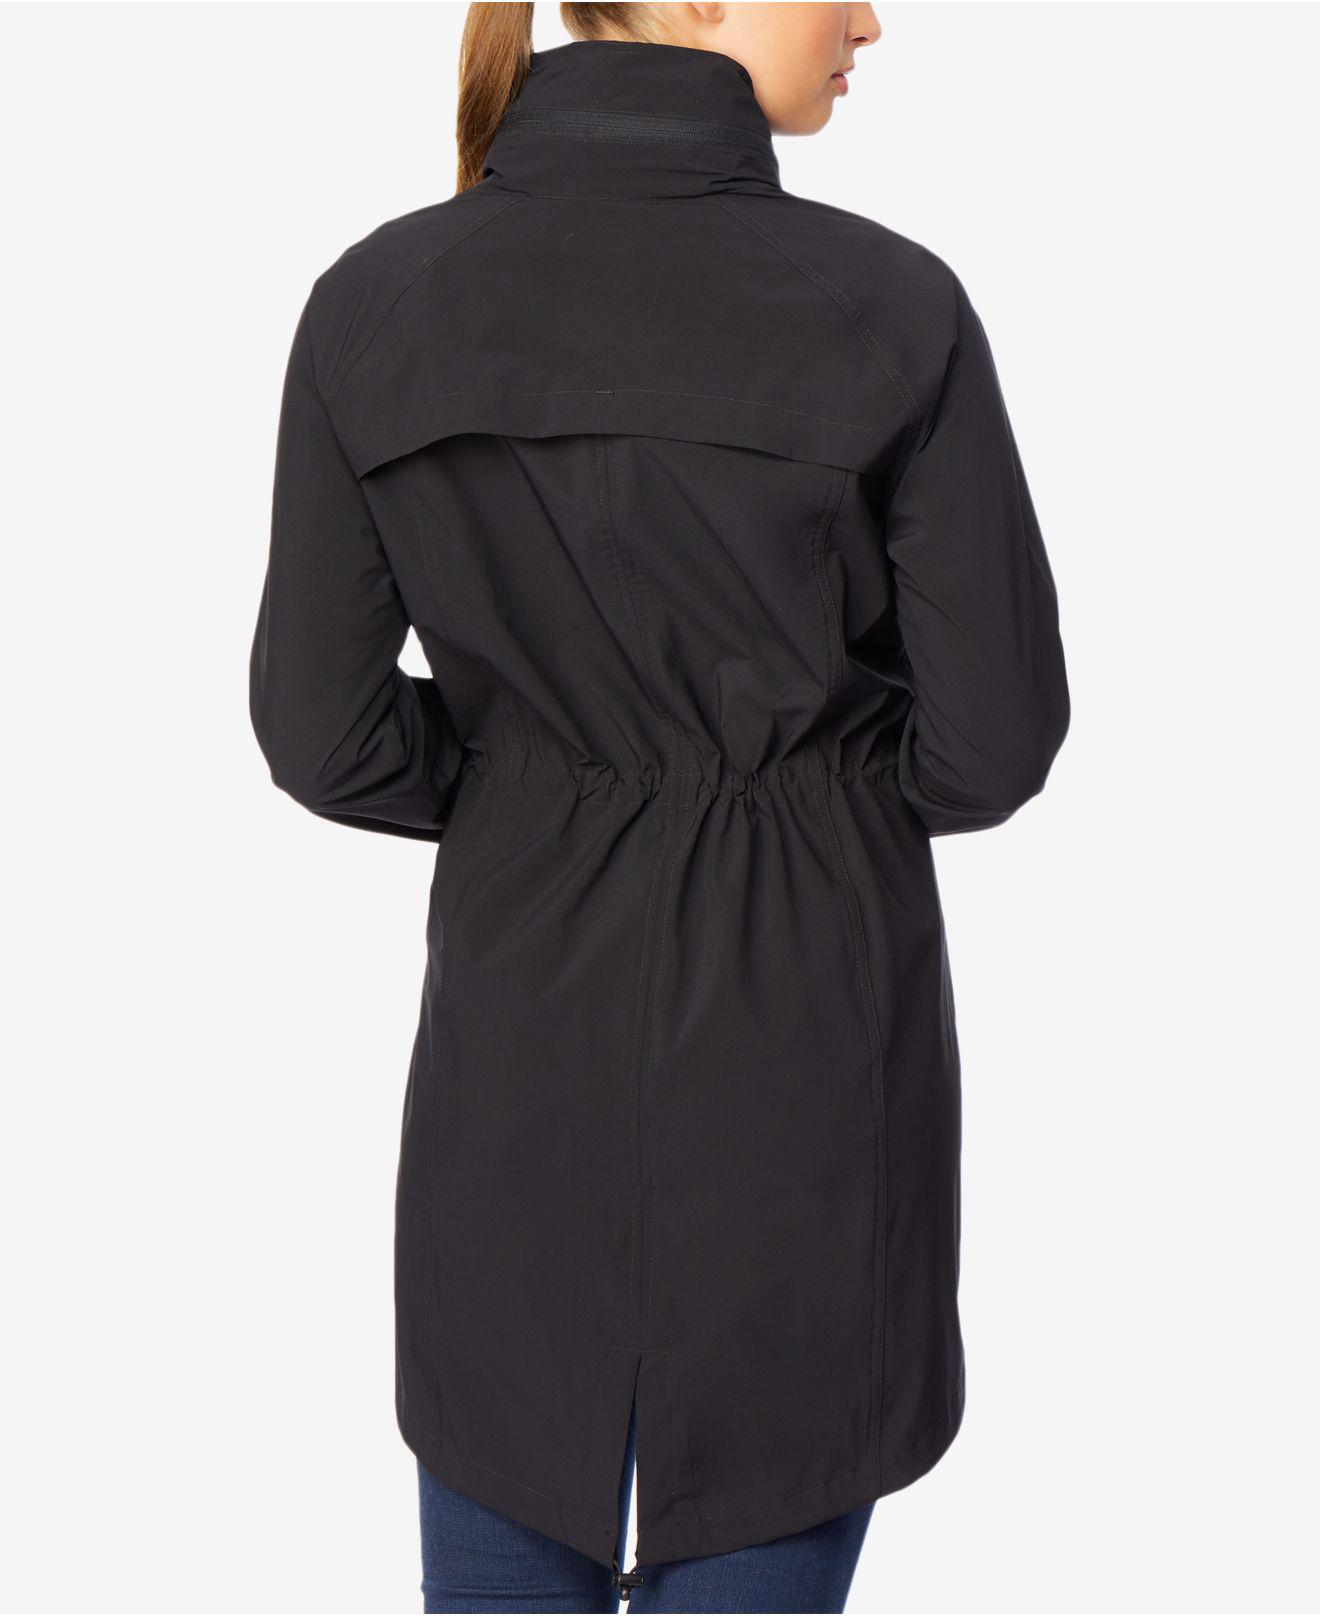 d4fb30efcbeeb Lyst - 32 Degrees Hooded Cinched-waist Anorak Raincoat in Black